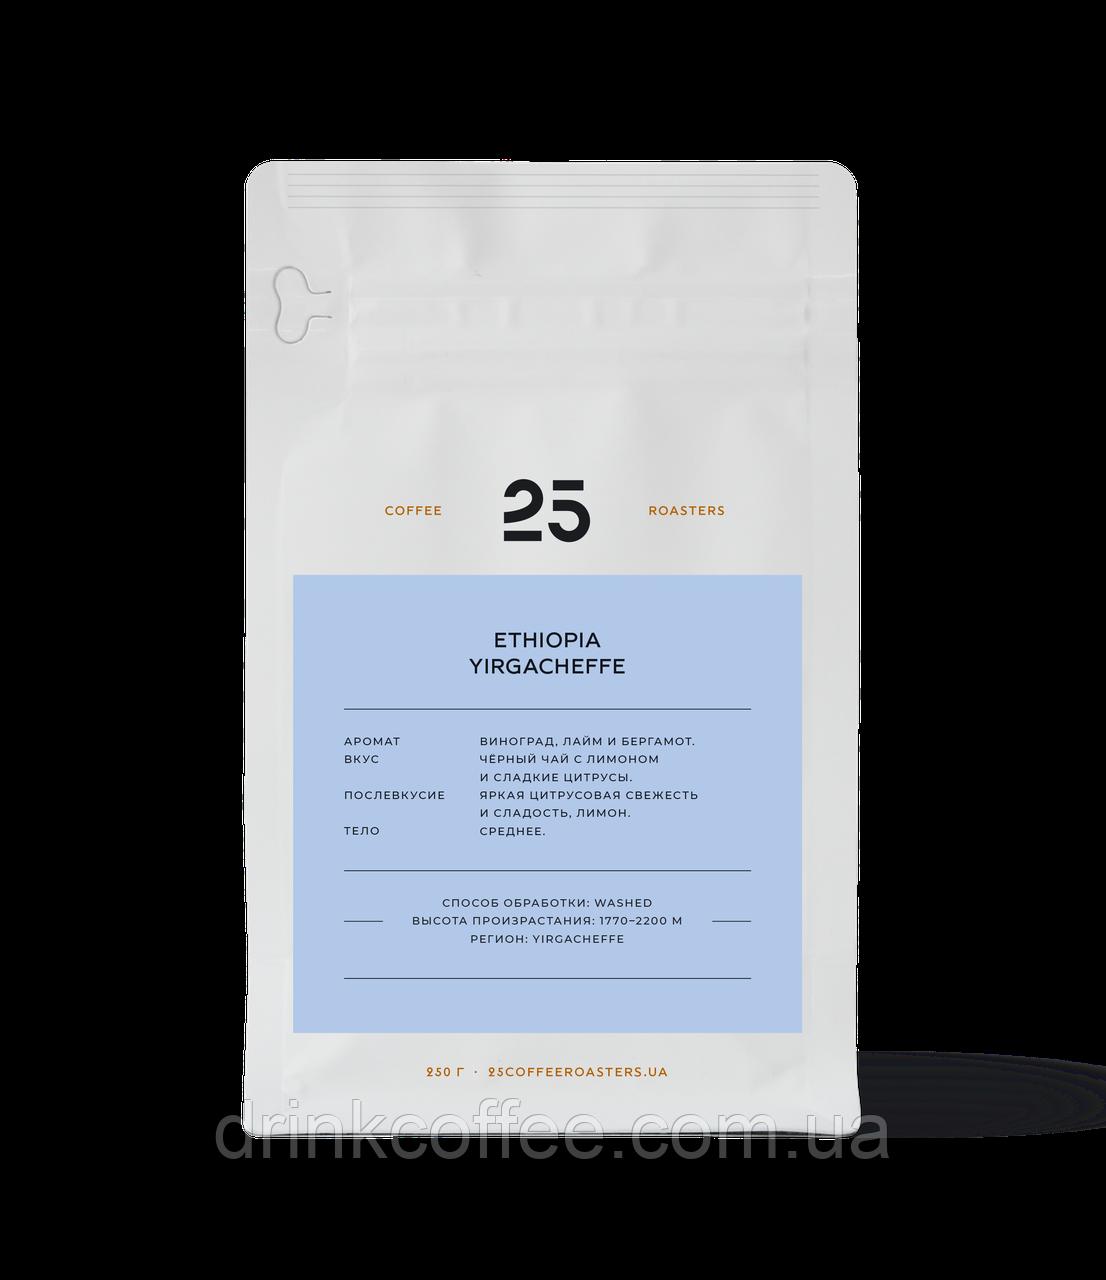 Кофе Эфиопия Иргачефф, зерно, 25 Coffee Roasters, 1кг